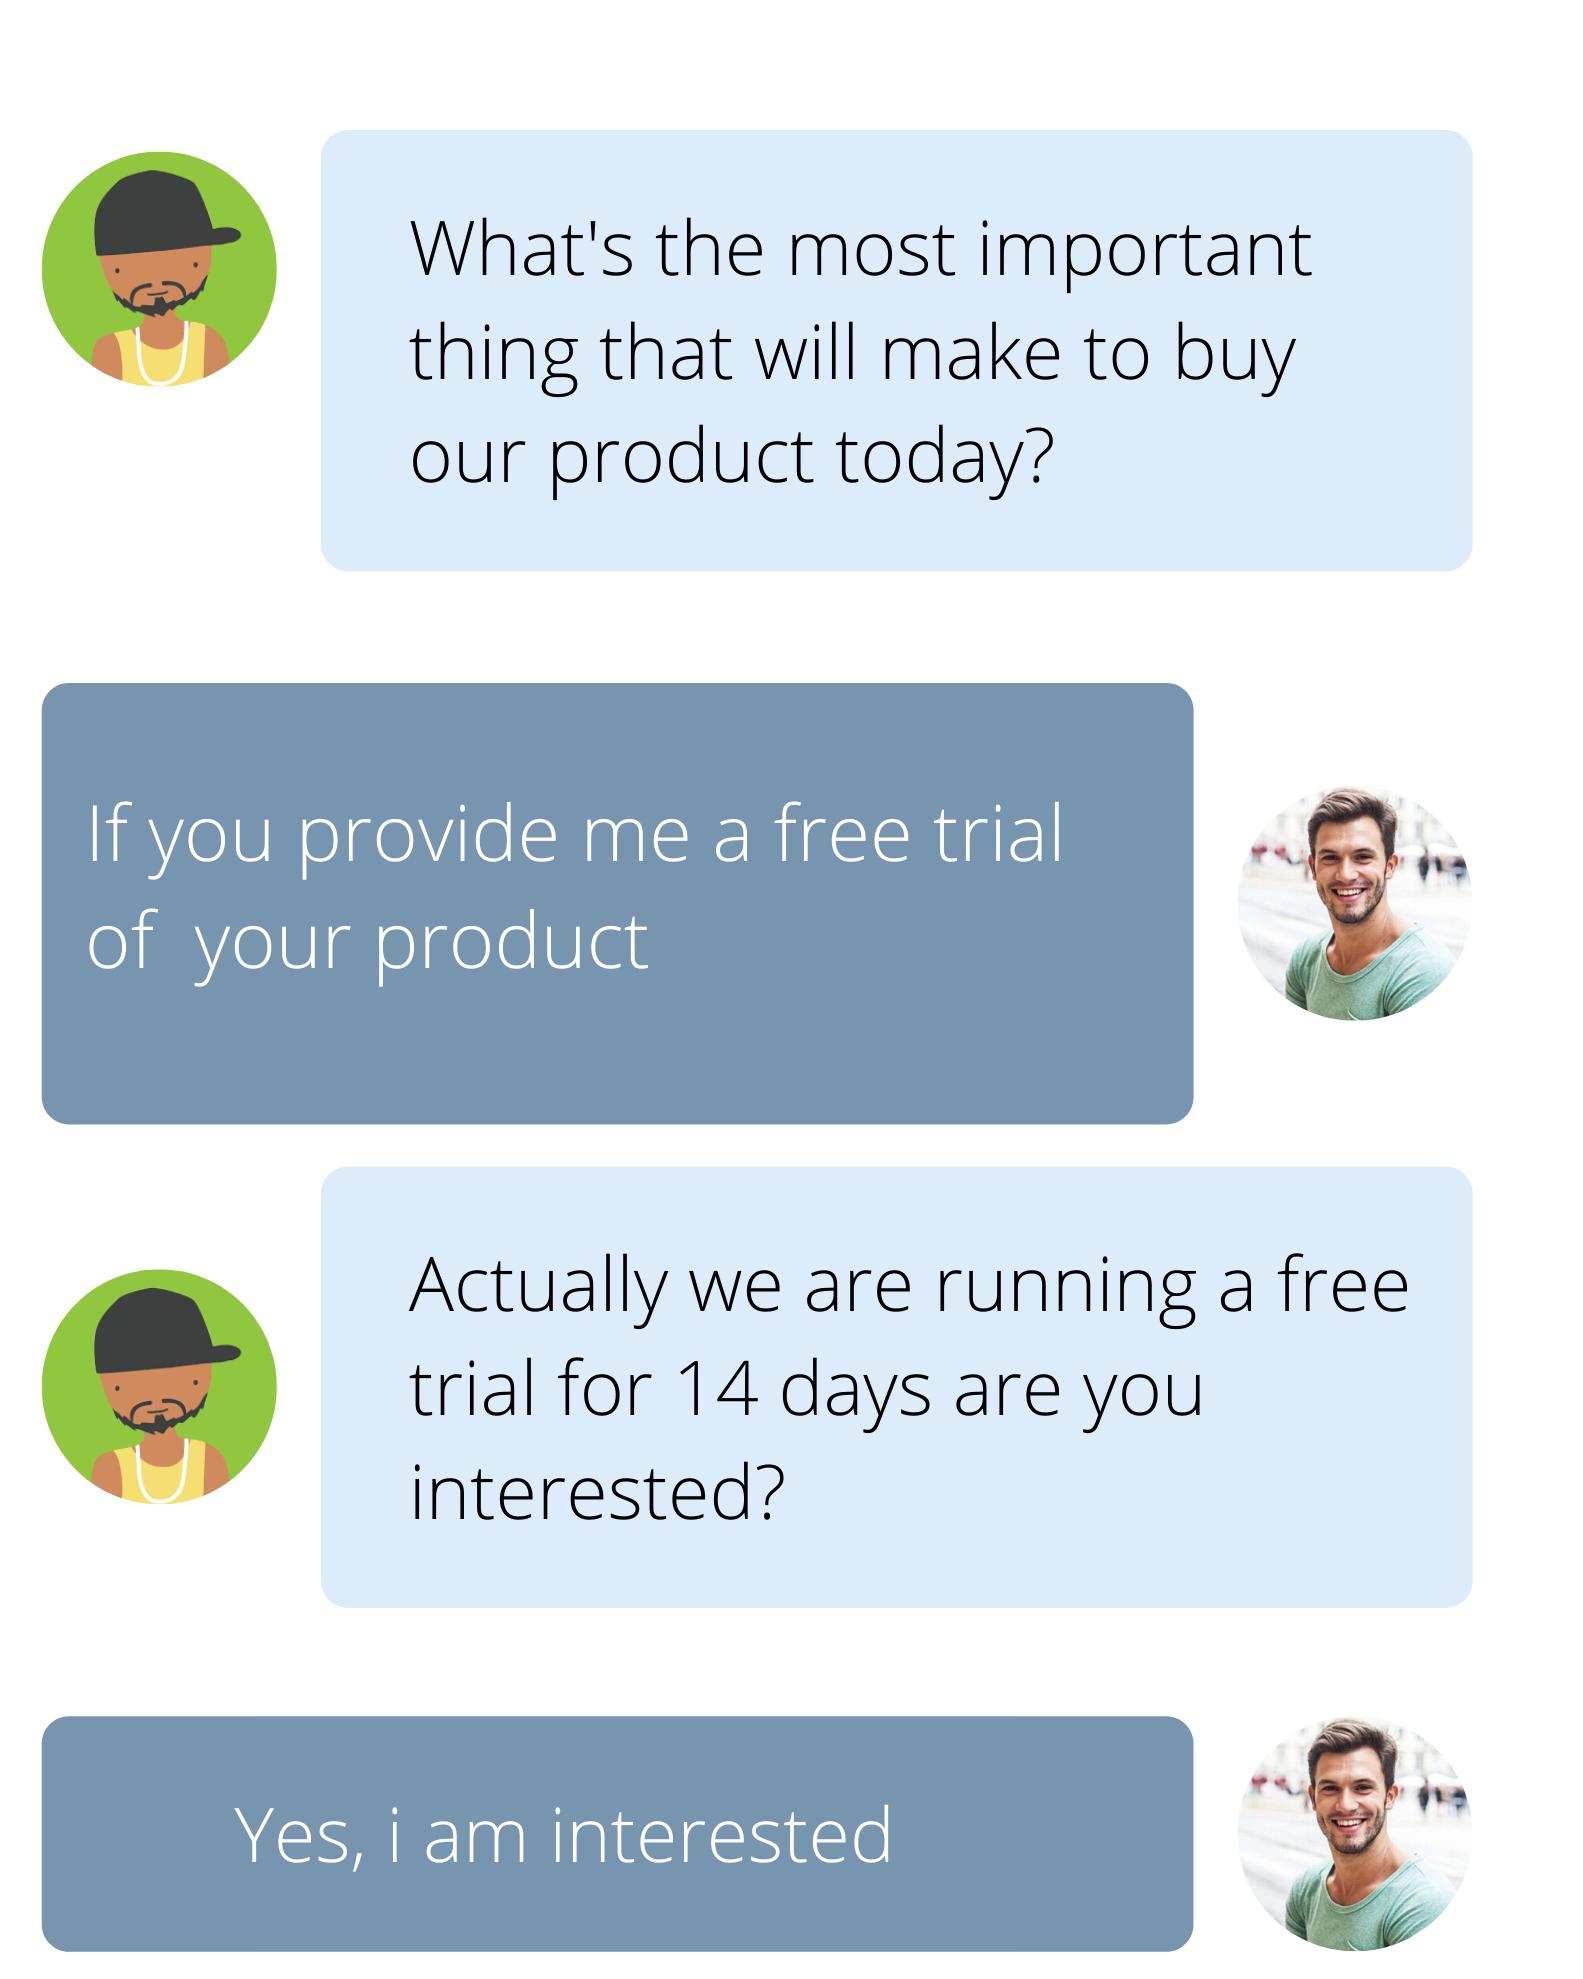 Smart chatbot psychology